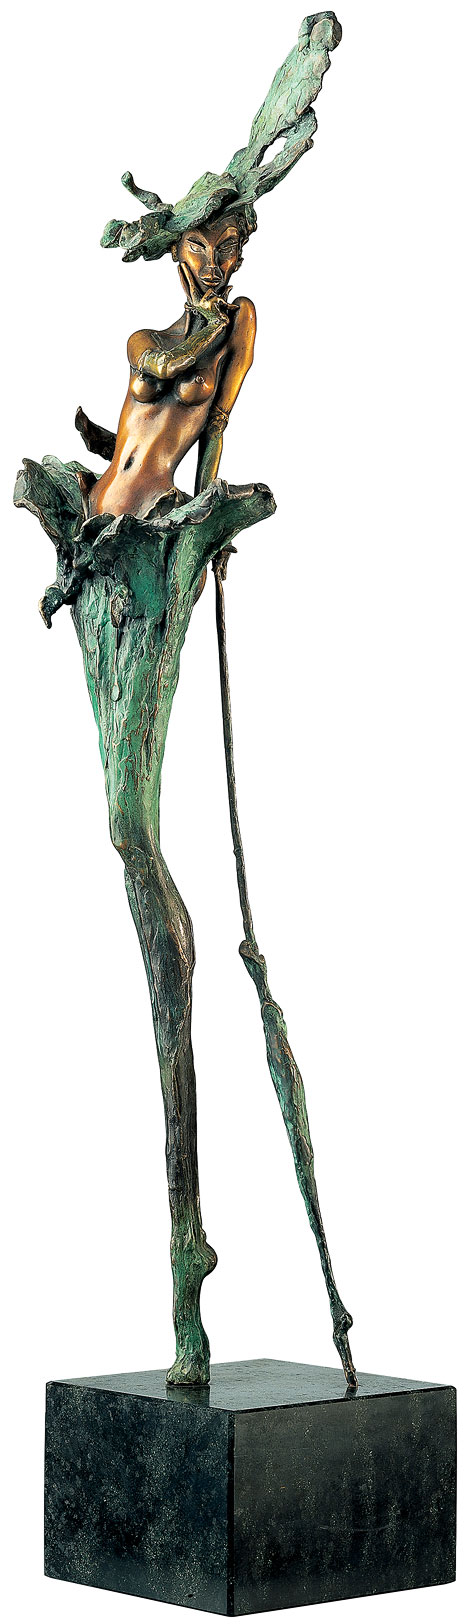 "Skulptur ""When the lady smiles"" (1995), Bronze"